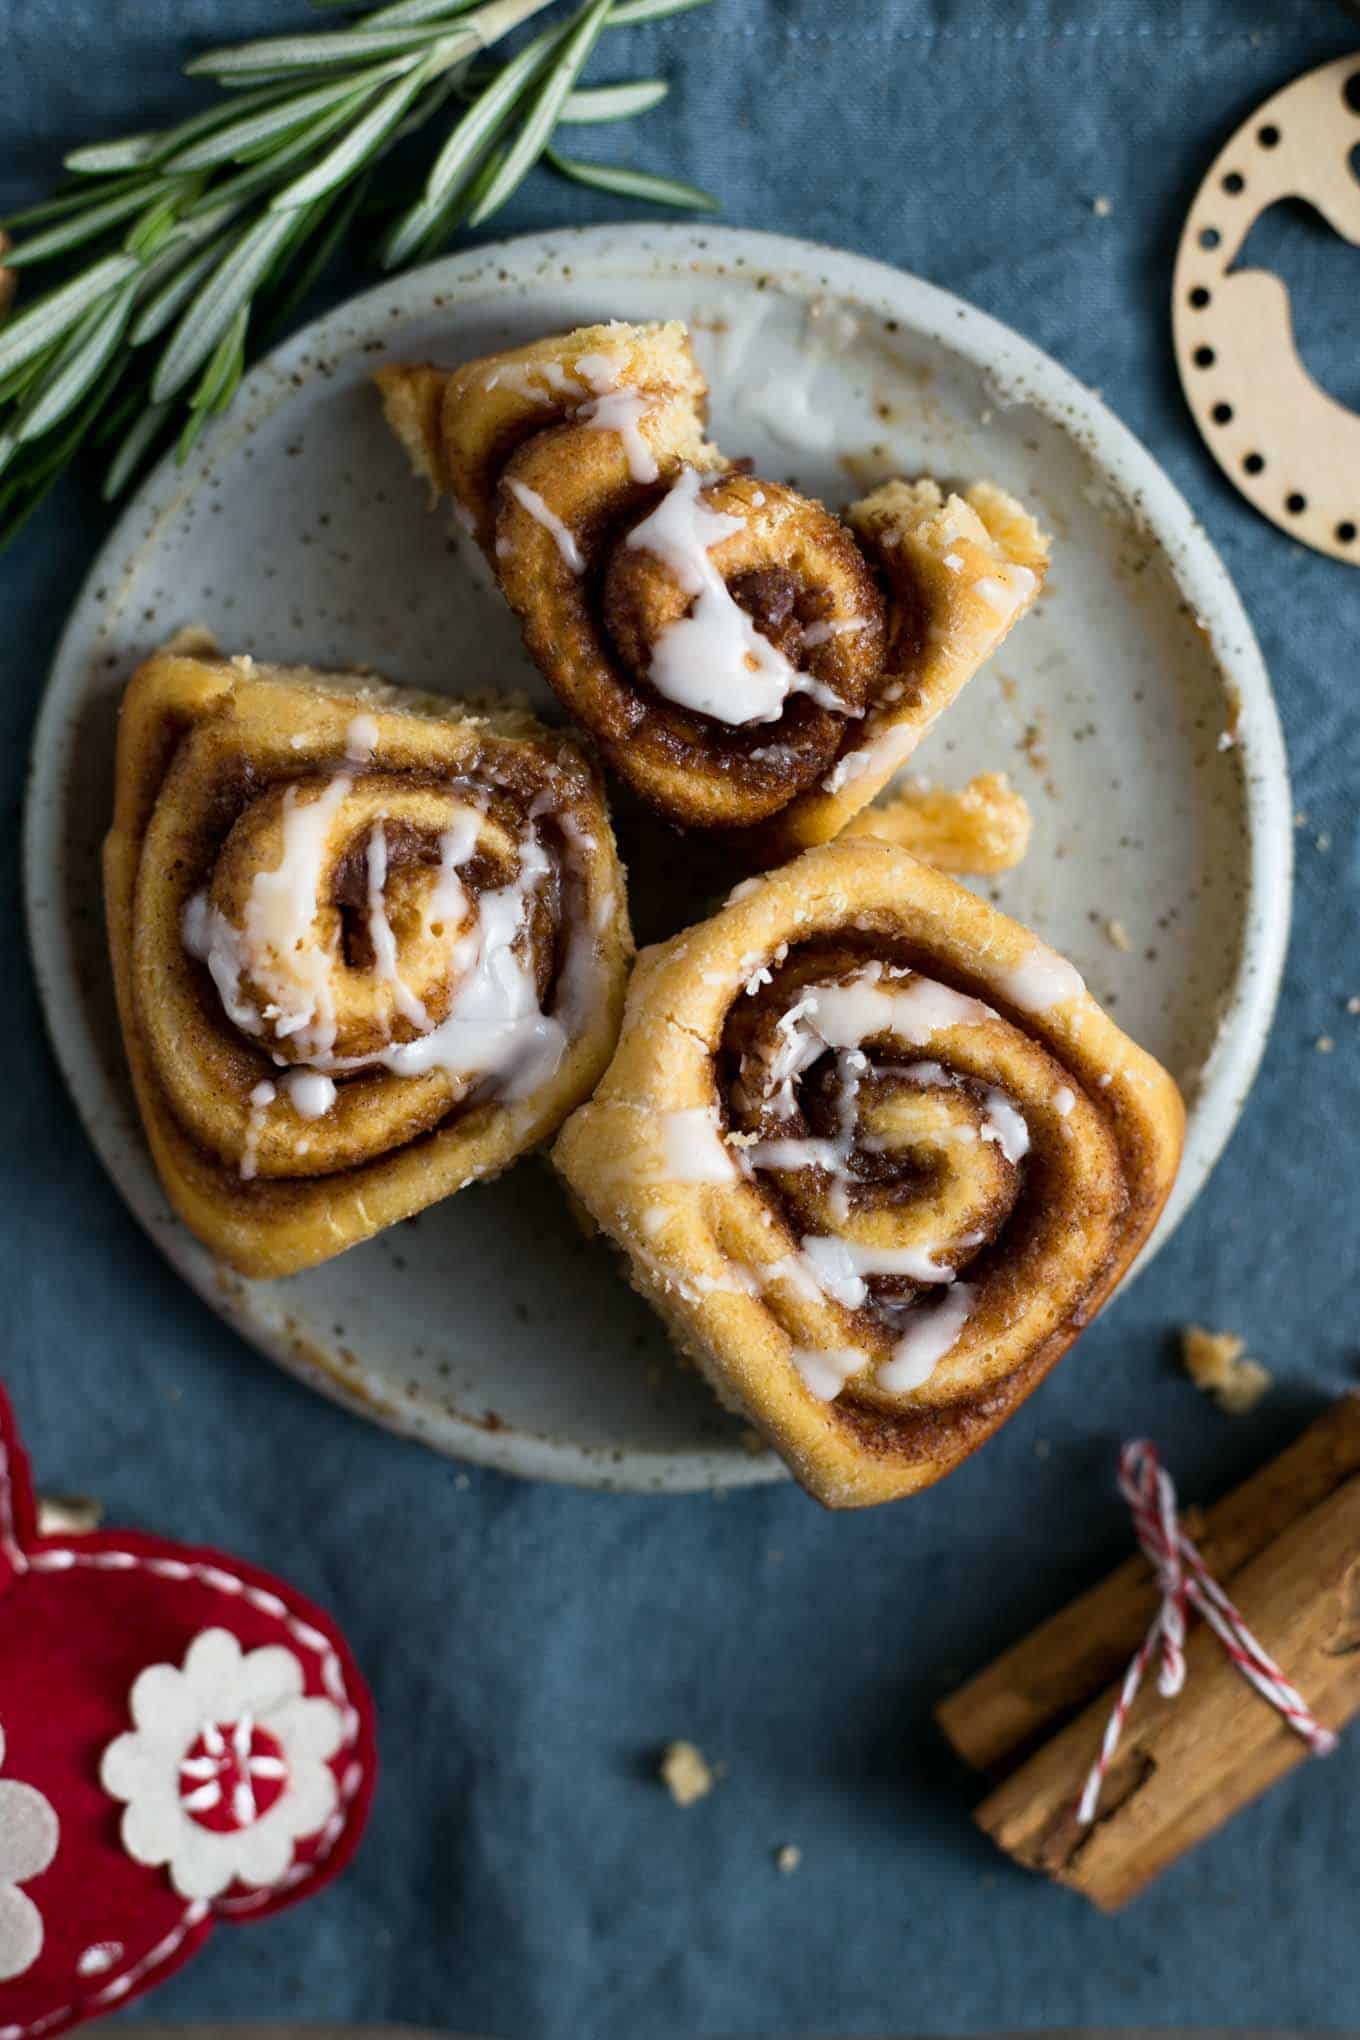 Sweet potato cinnamon rolls with icing #vegan #cinnamonrolls #brunch | via @annabanana.co